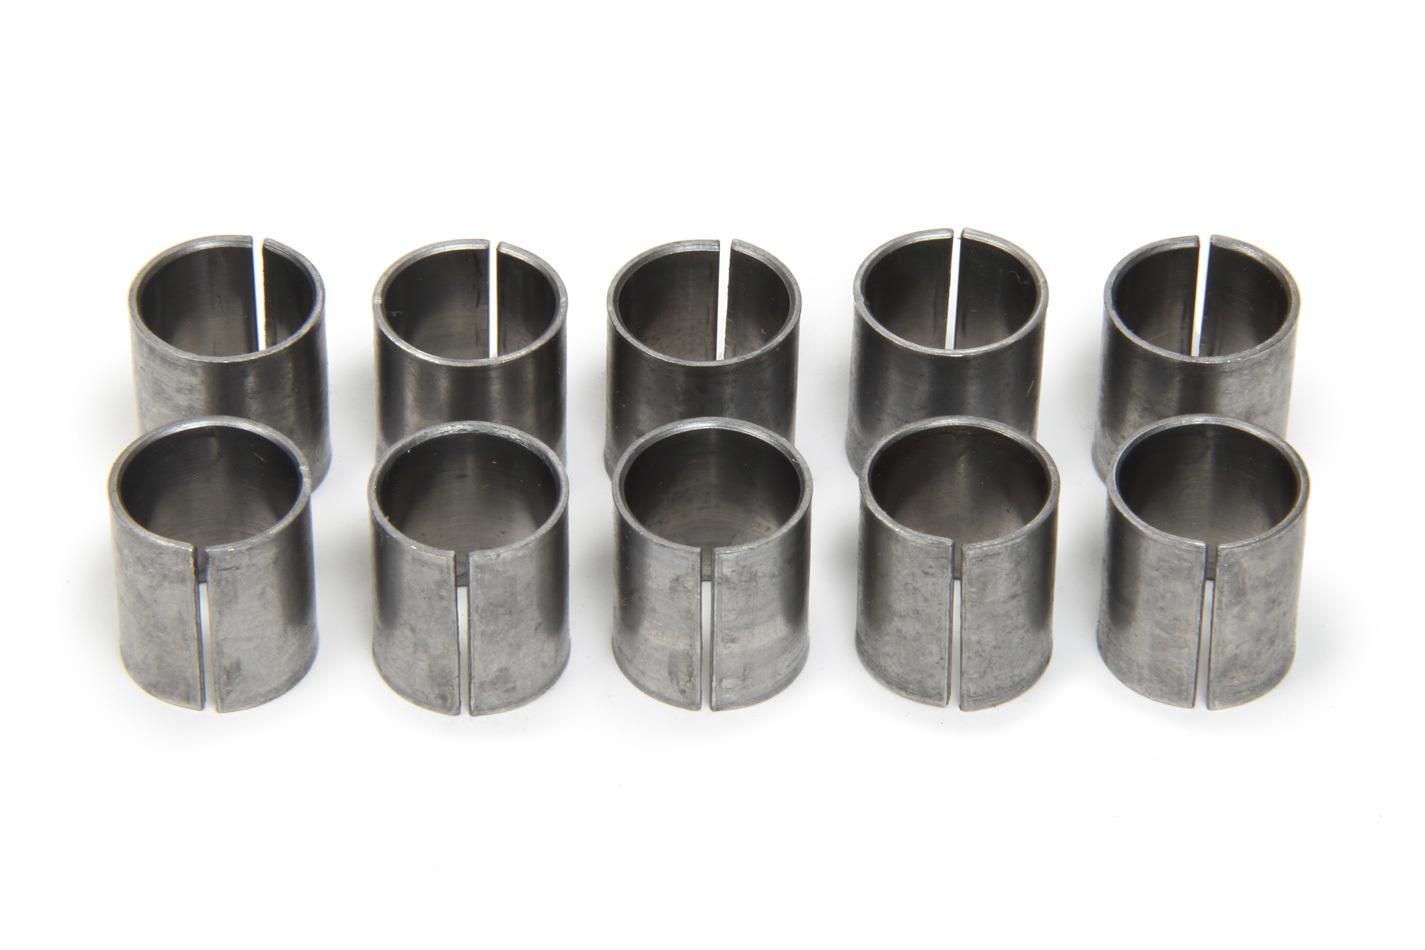 Pioneer PF-142-10 Cylinder Head Dowels, Steel, Natural, Ford 4-Cylinder, Set of 10